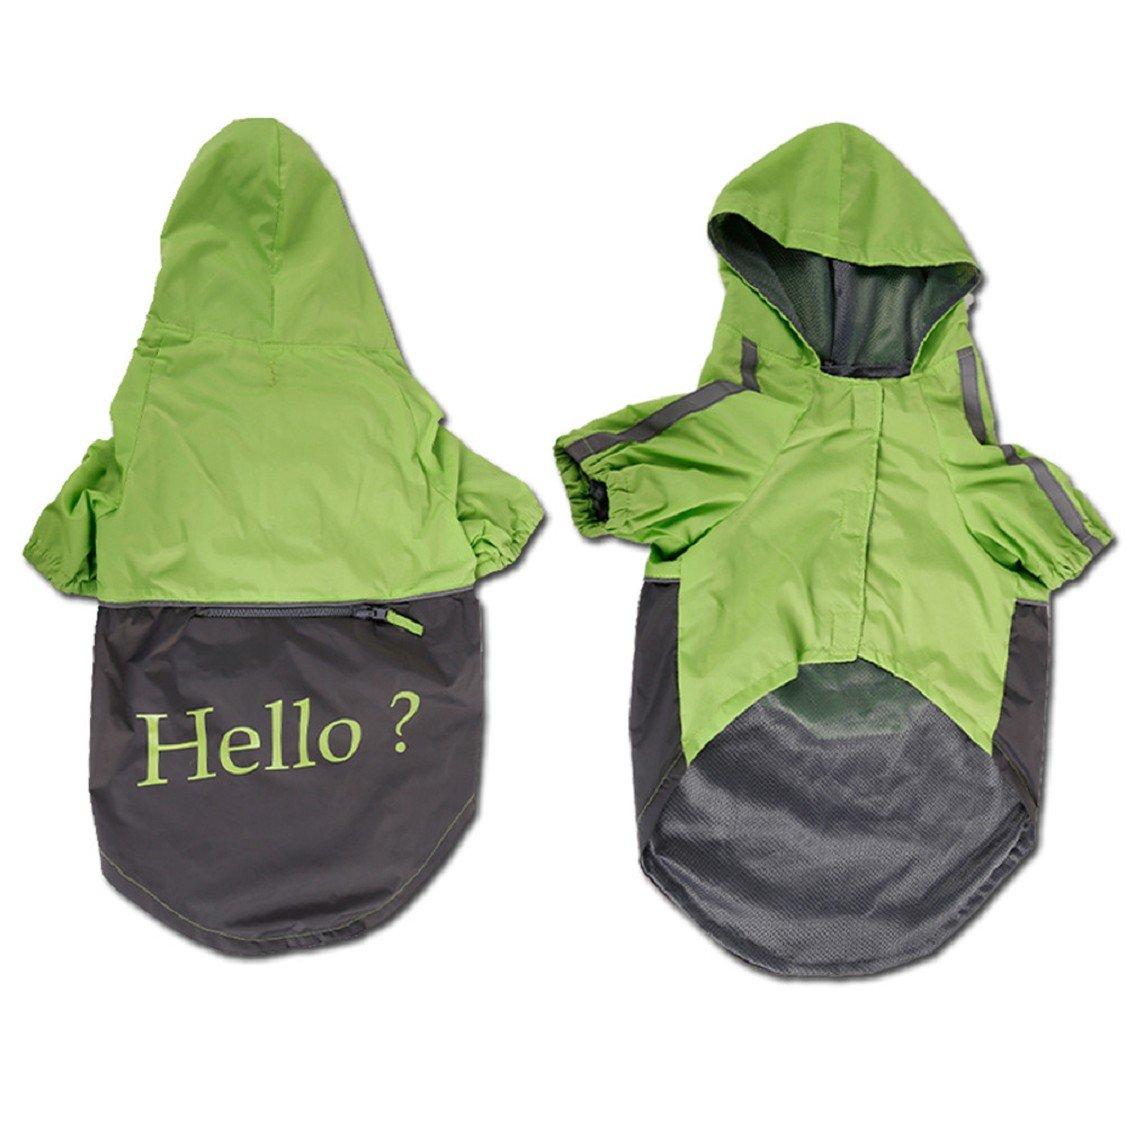 Green XXL Green XXL Egmy Fashion Polyester Largr Medium Pet Dog Raincoats Clothes Waterproof Coat Jackets Dogs Pet Hoodie Warm Clothes (XXL, Green)